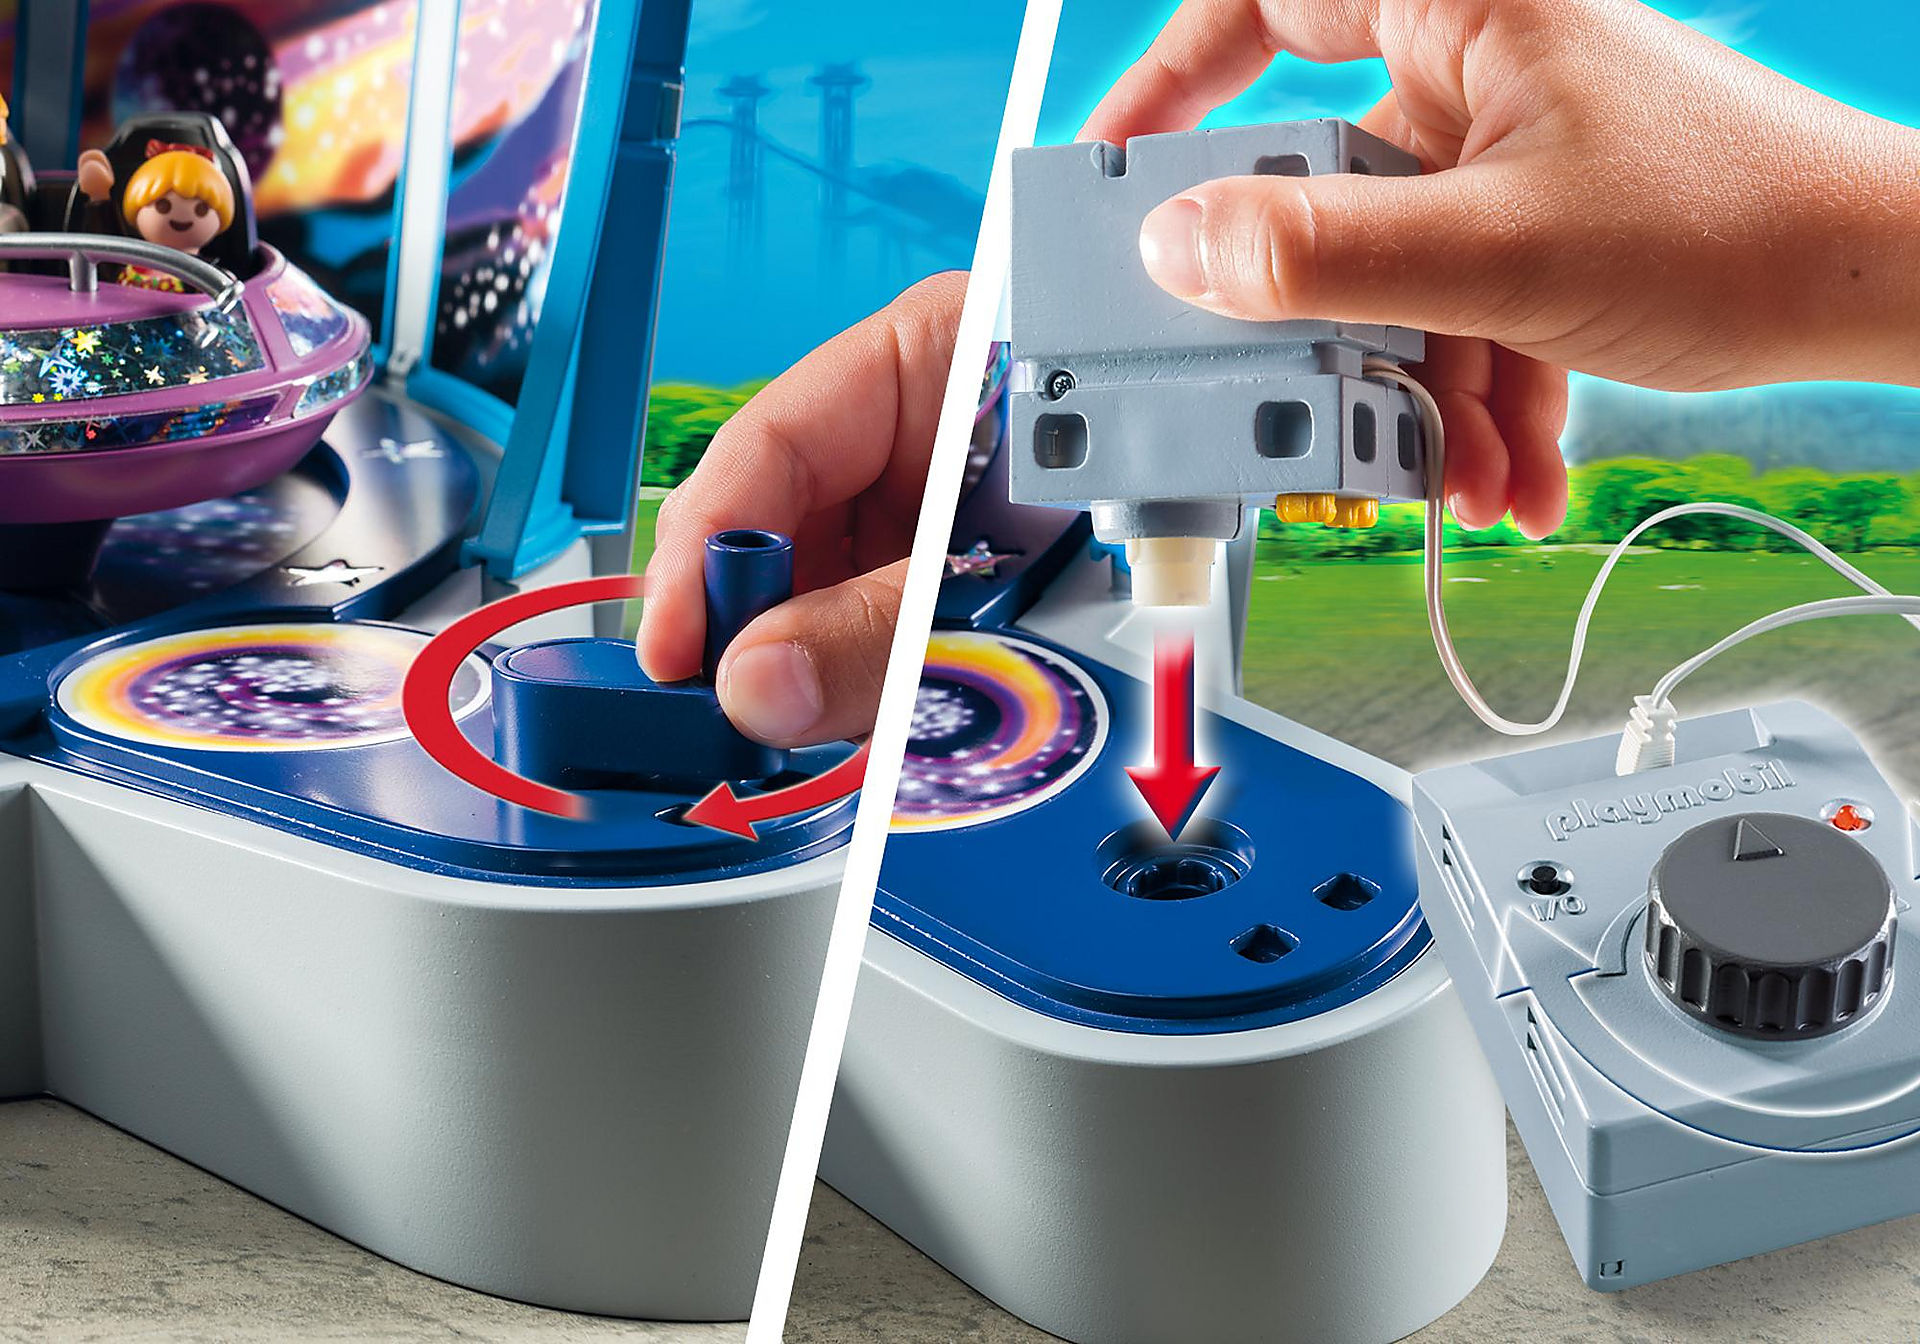 http://media.playmobil.com/i/playmobil/5554_product_extra3/Περιστρεφόμενα διαστημόπλοια με φώτα